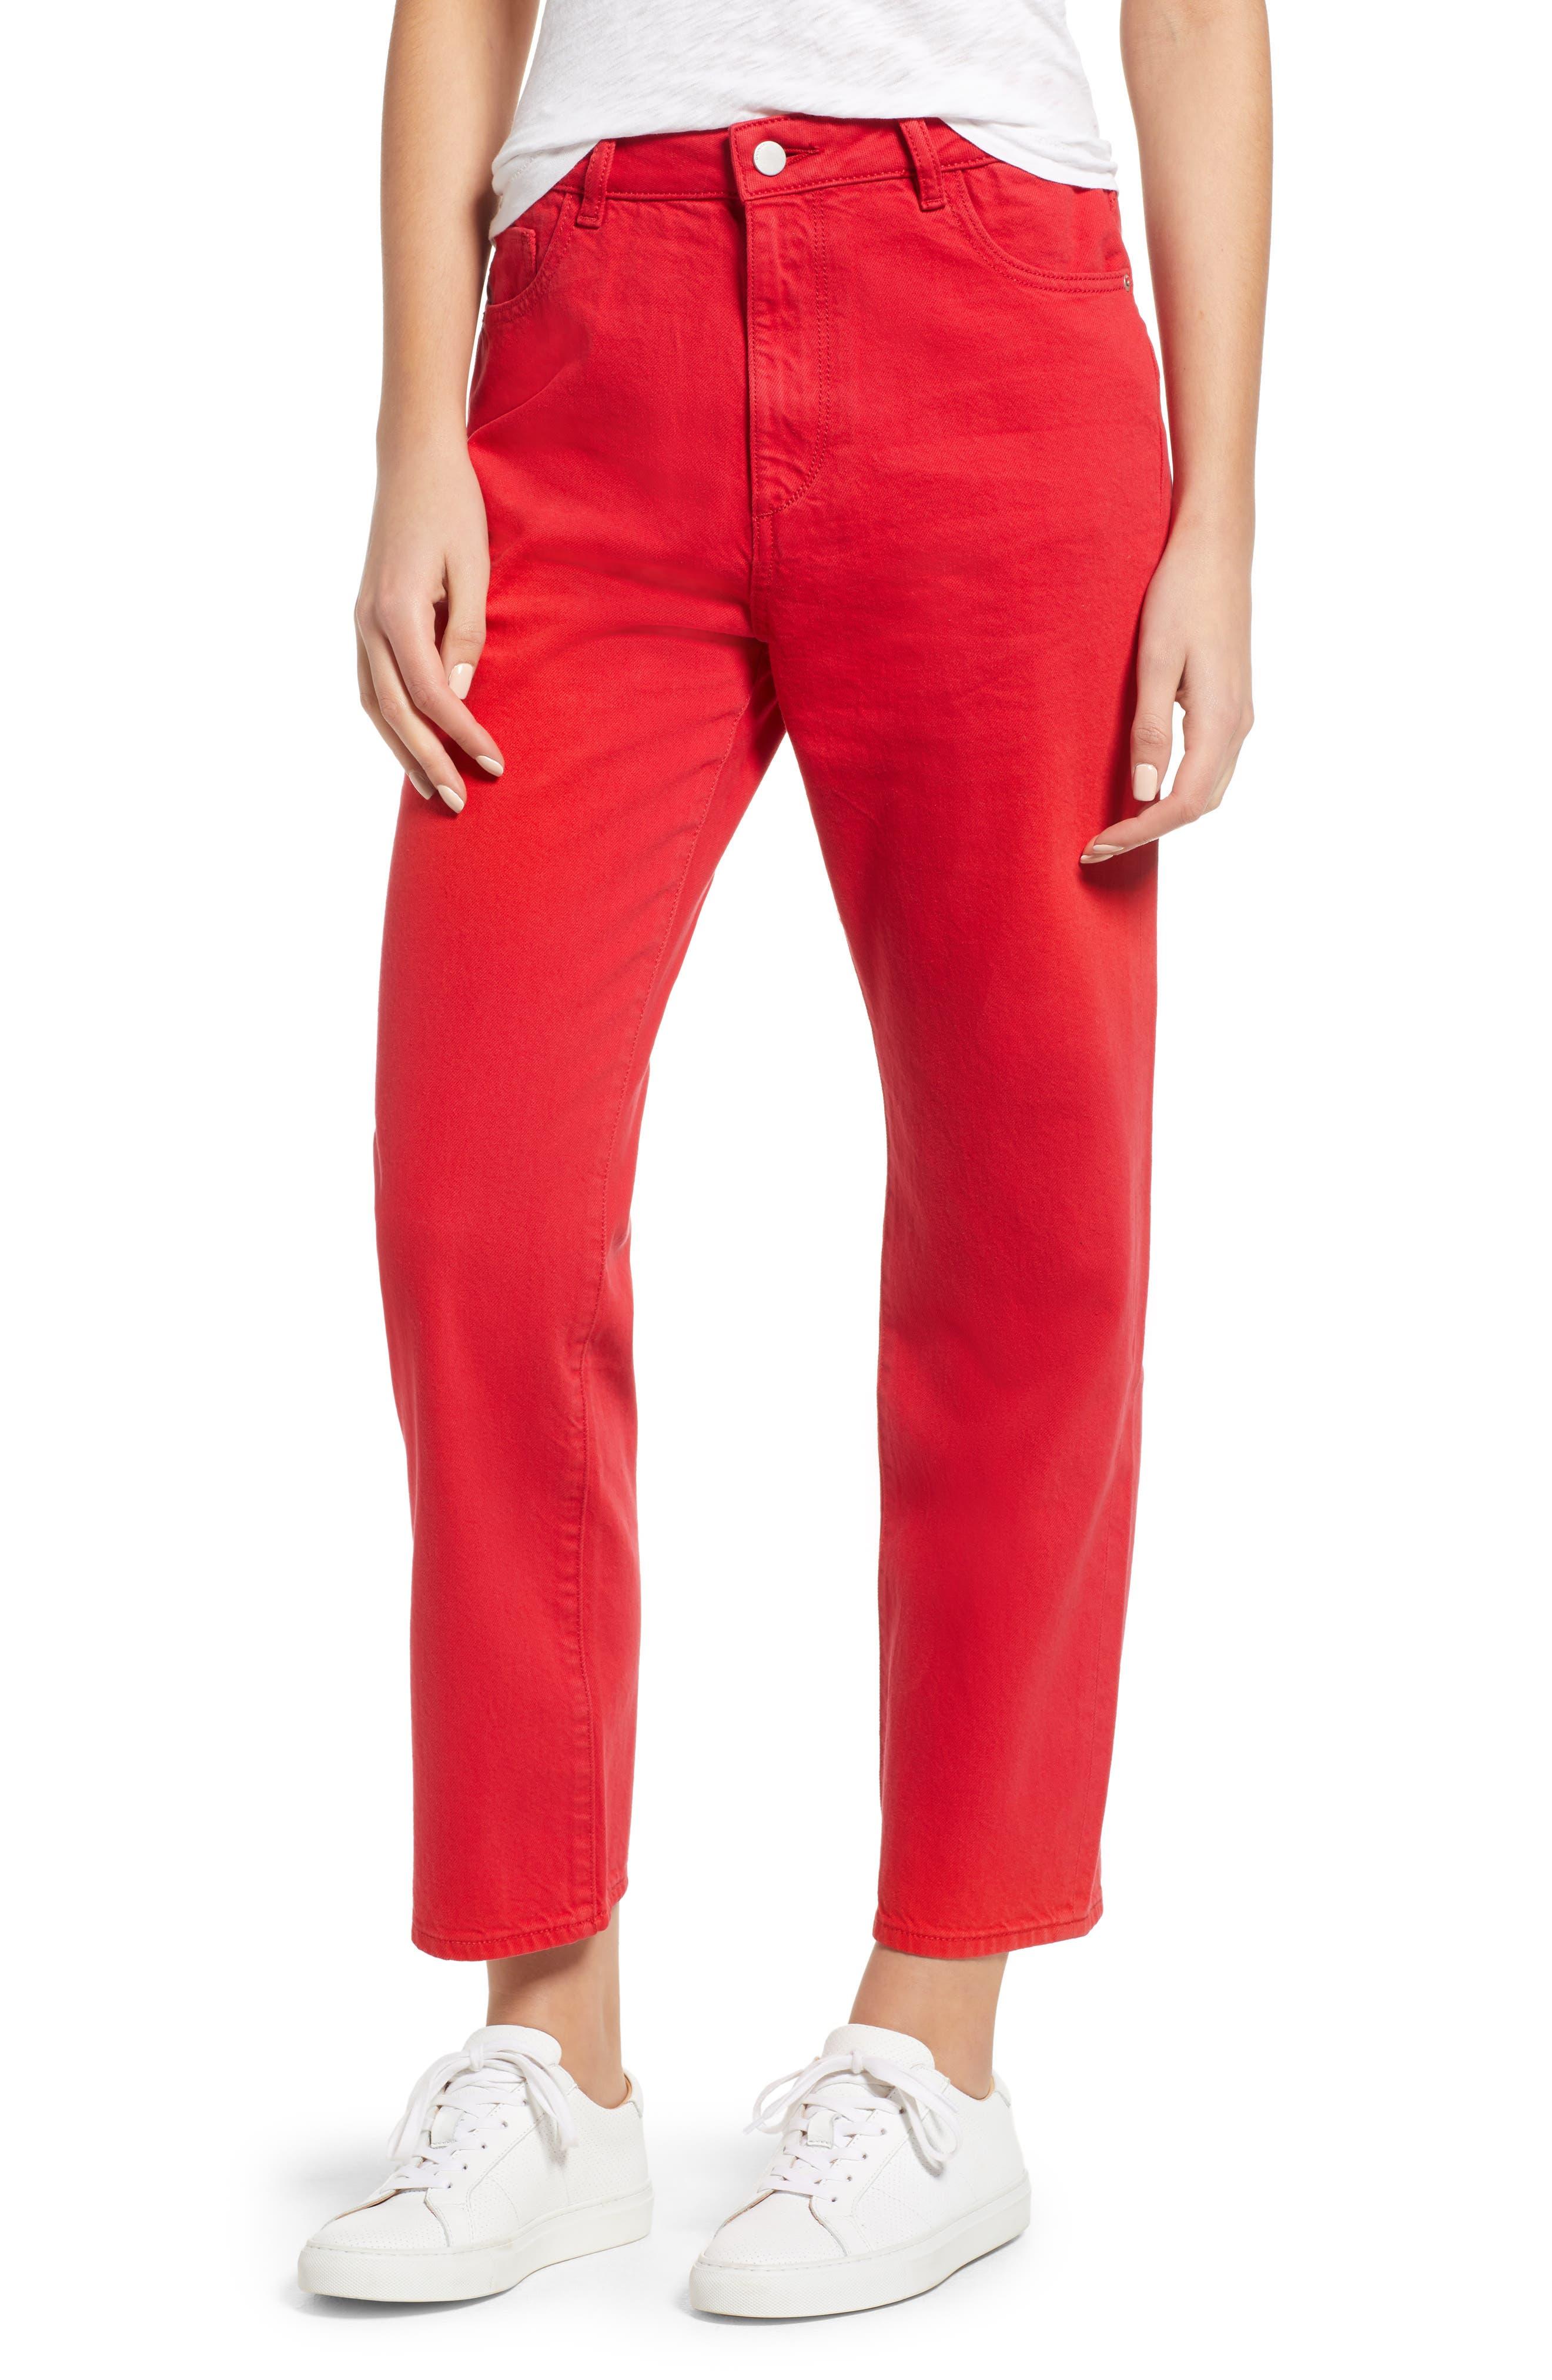 Jerry High Waist Straight Leg Jeans,                         Main,                         color, 600